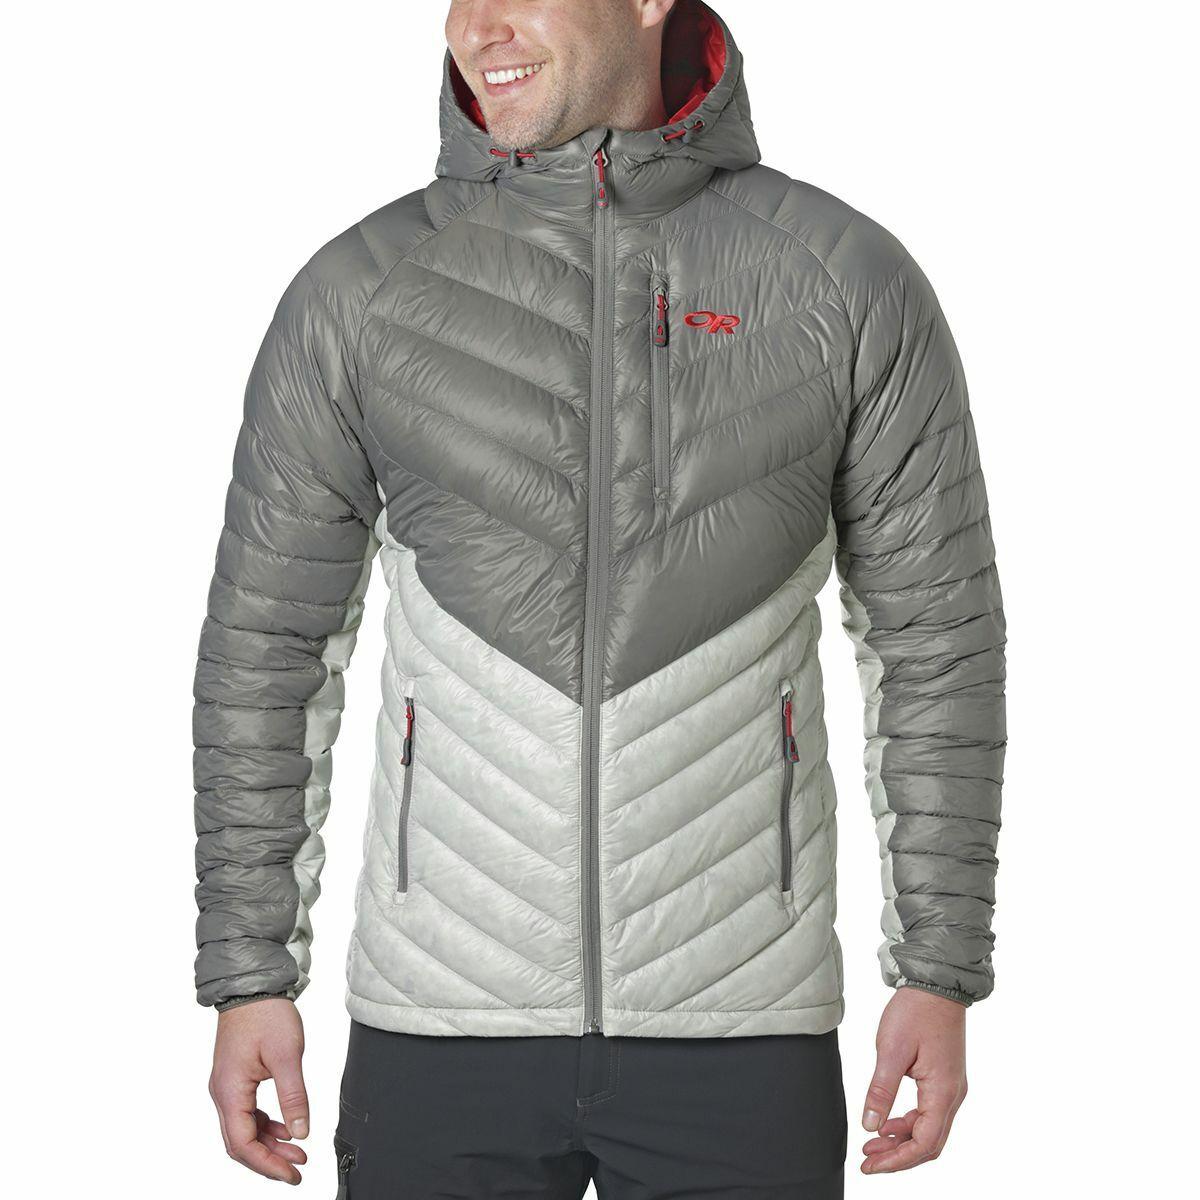 Outdoor Research Illuminate 800-fill Down Hoody Jacket, Pewter, Medium $269 NWT